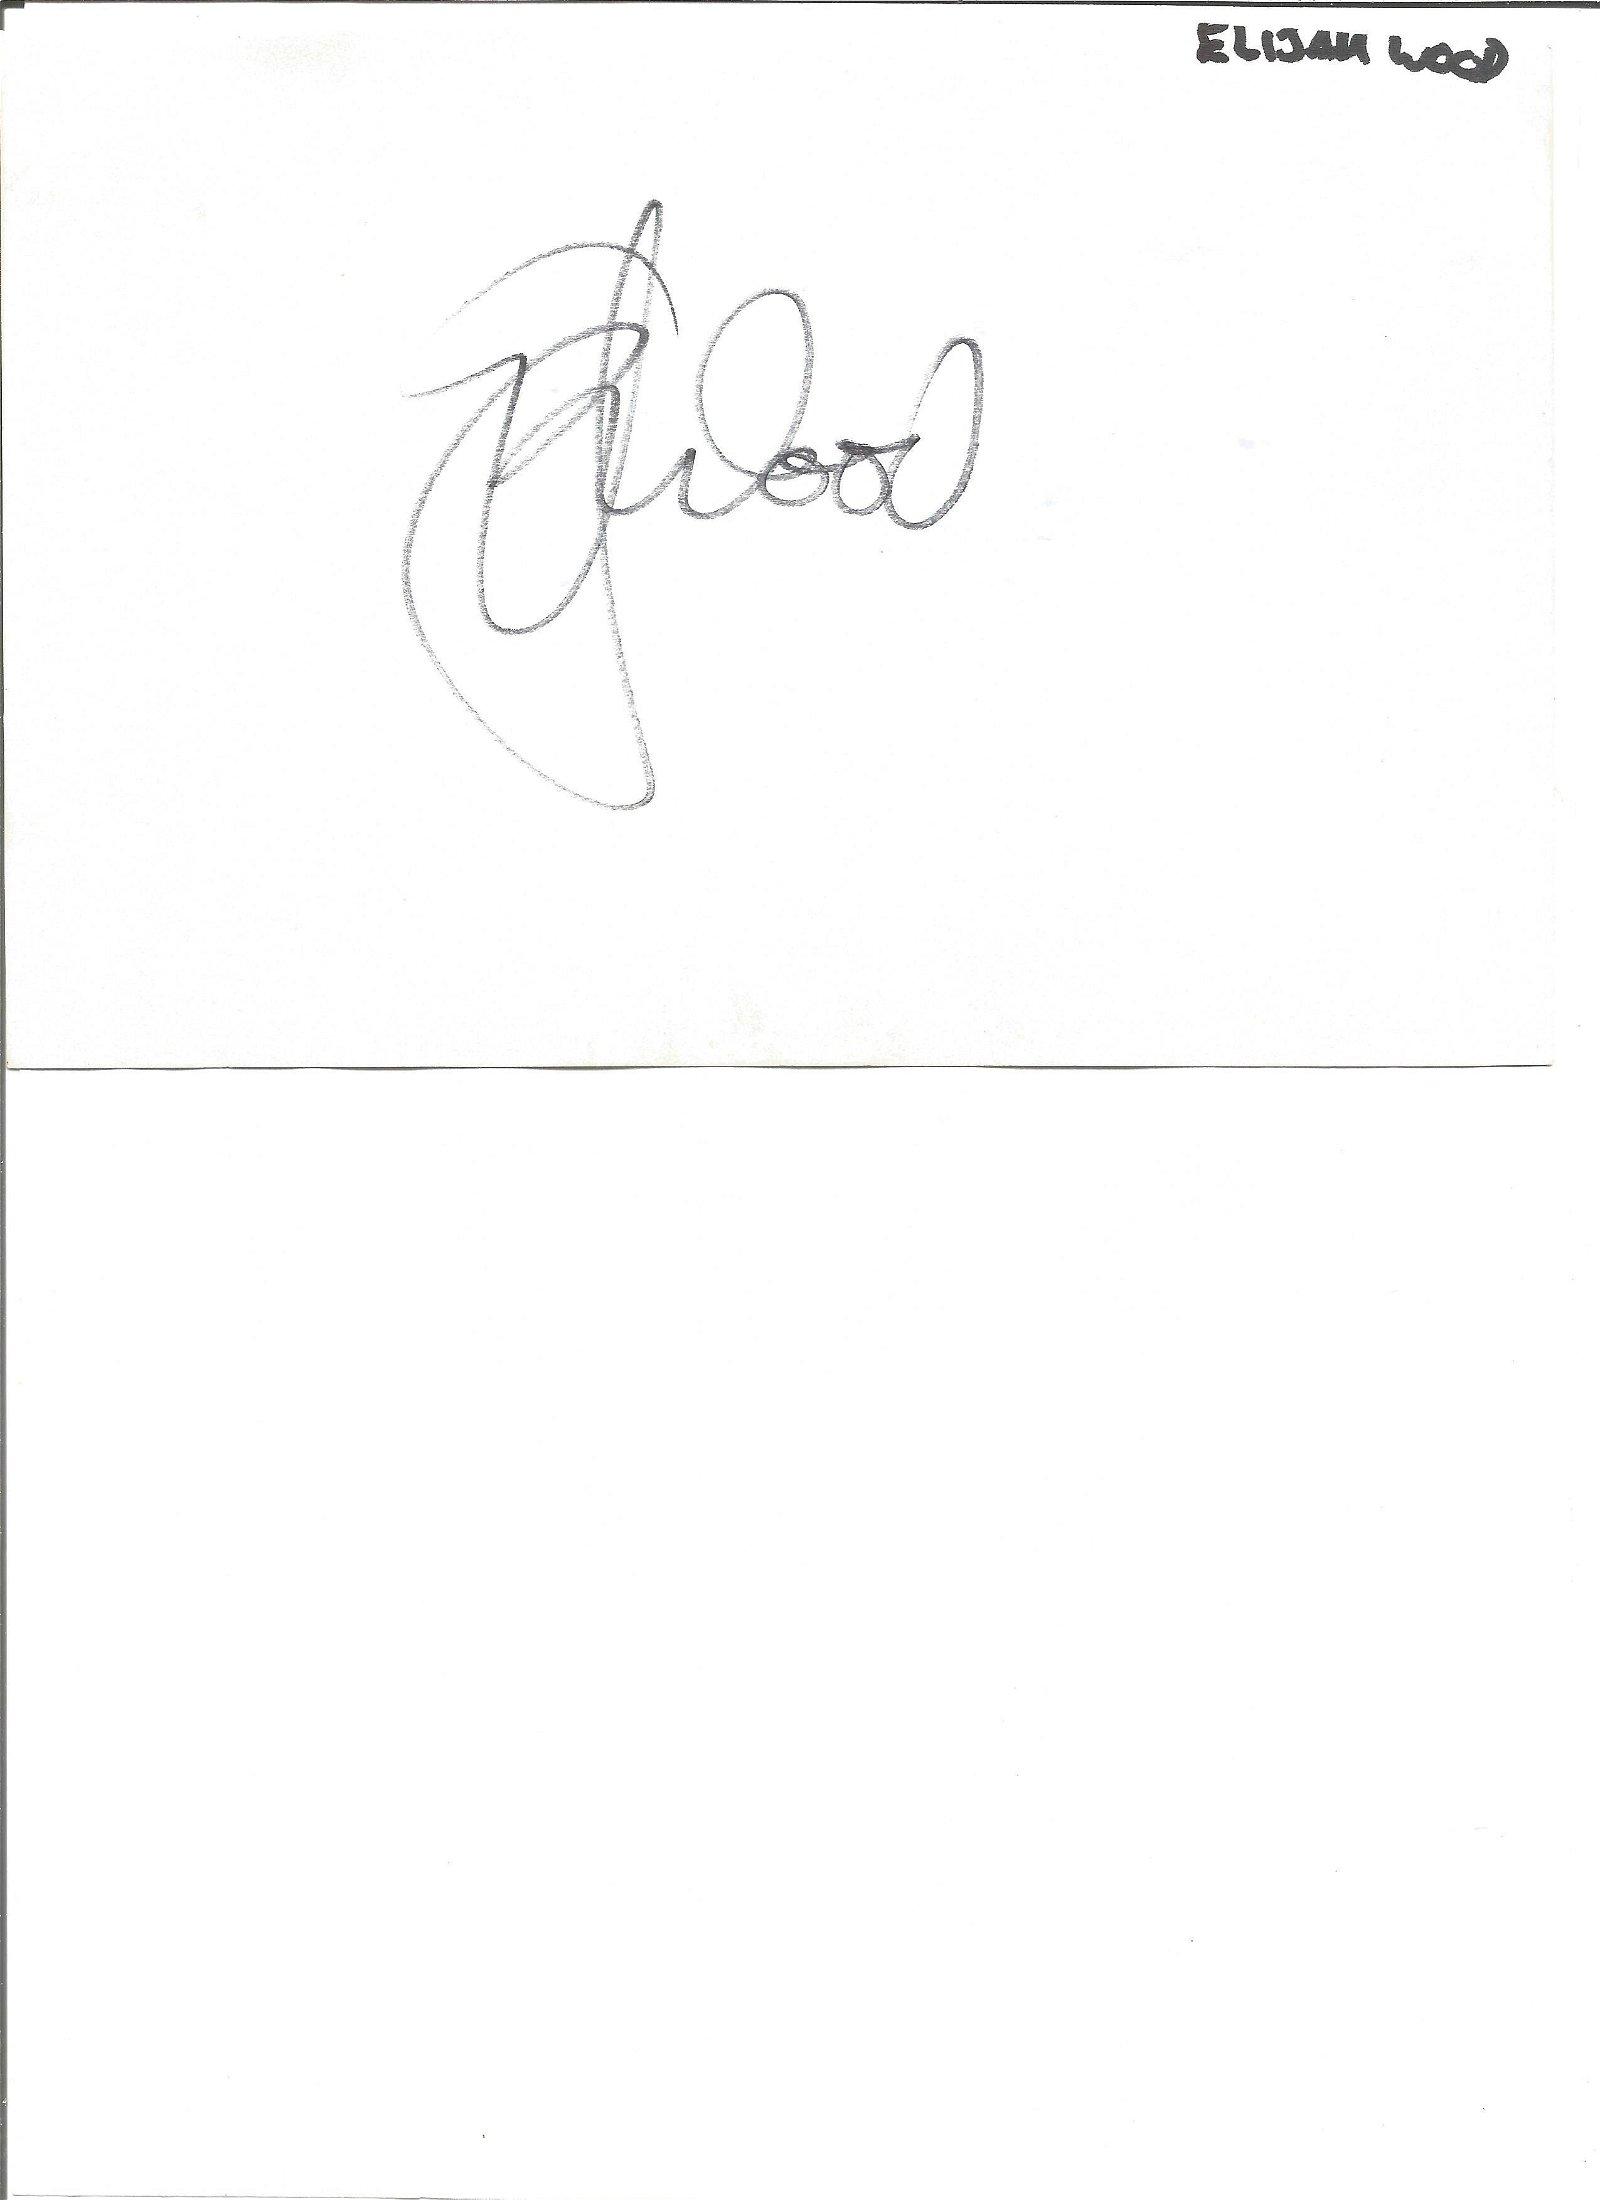 Elijah Wood large signature with 10x8 colour photo.